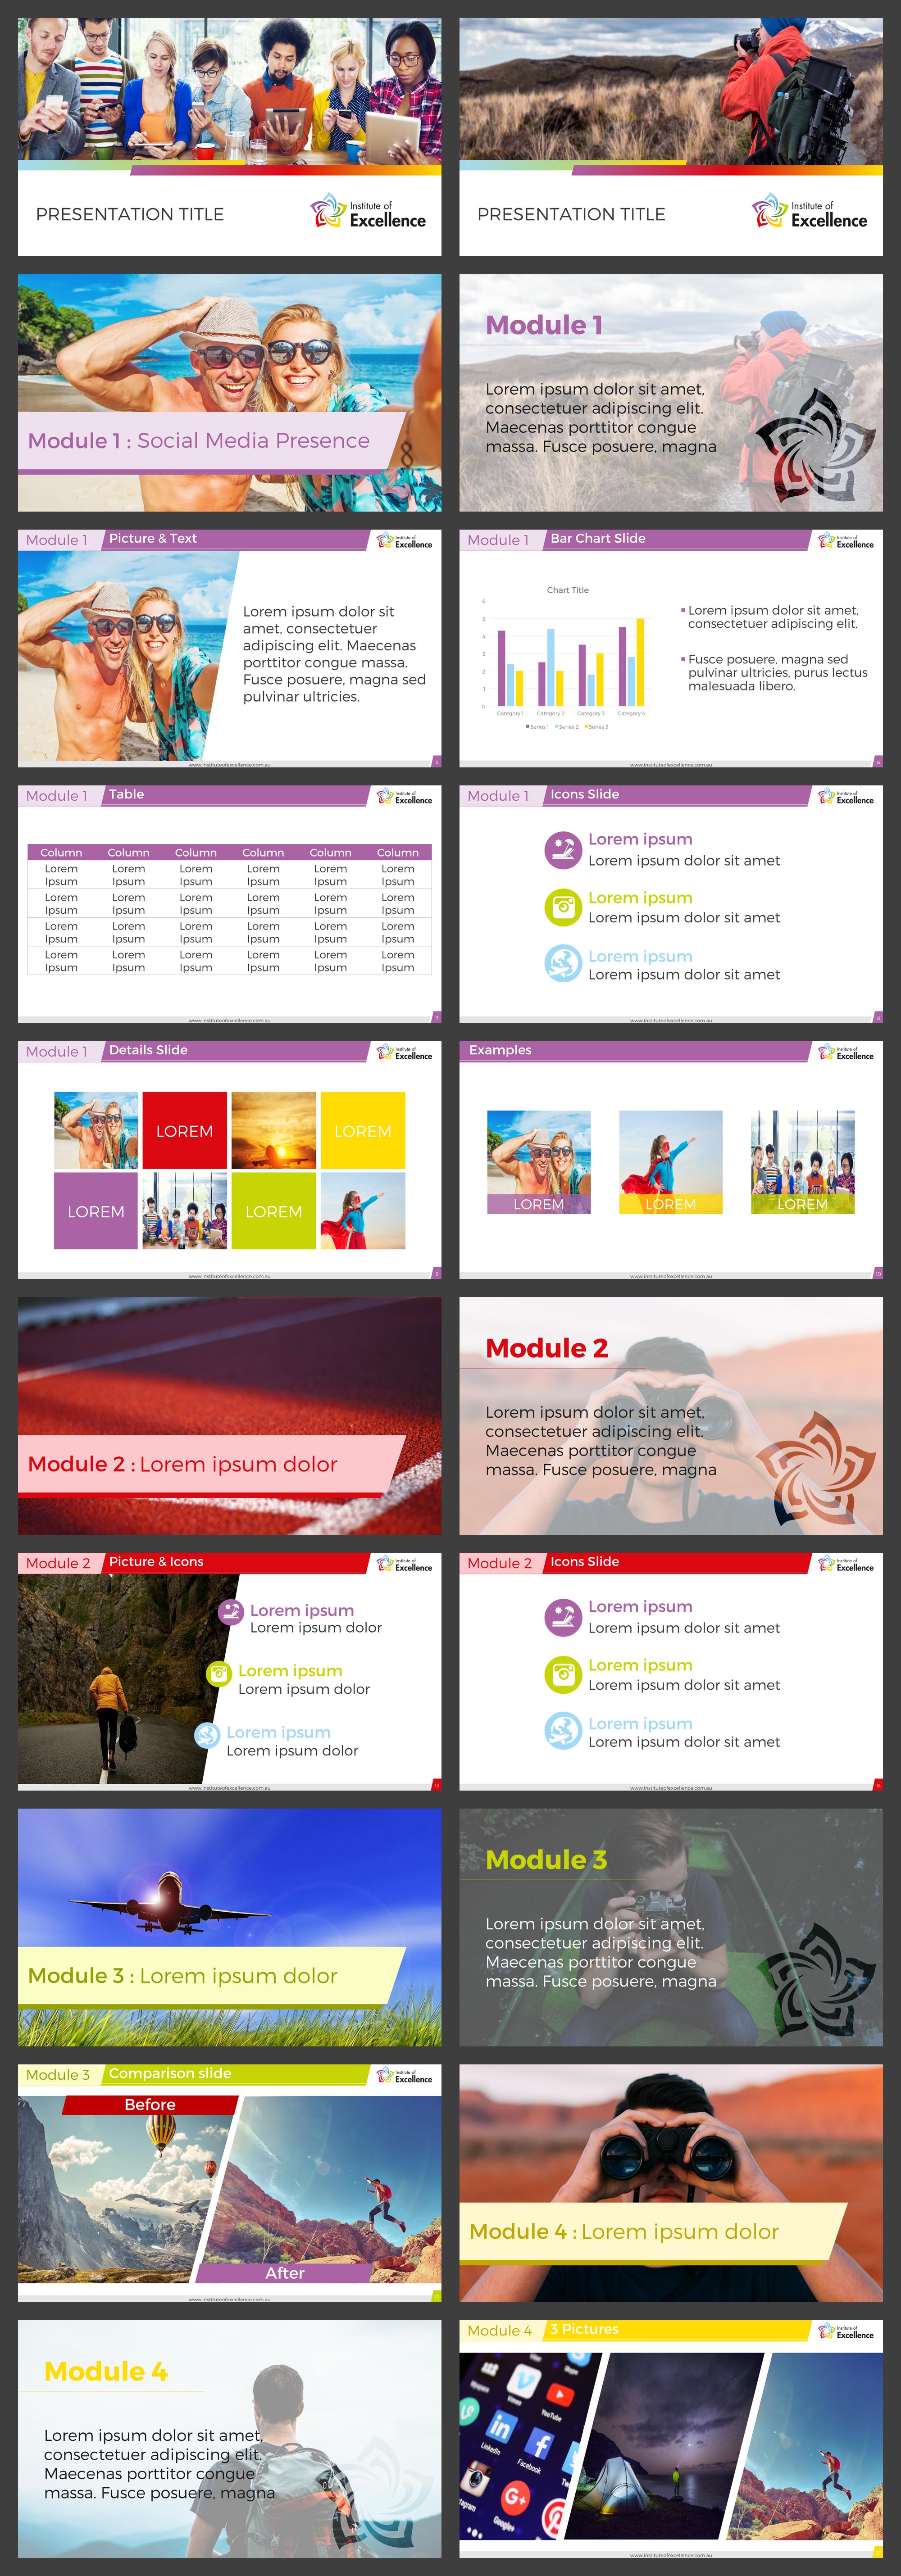 Tourism and social media training presentation template